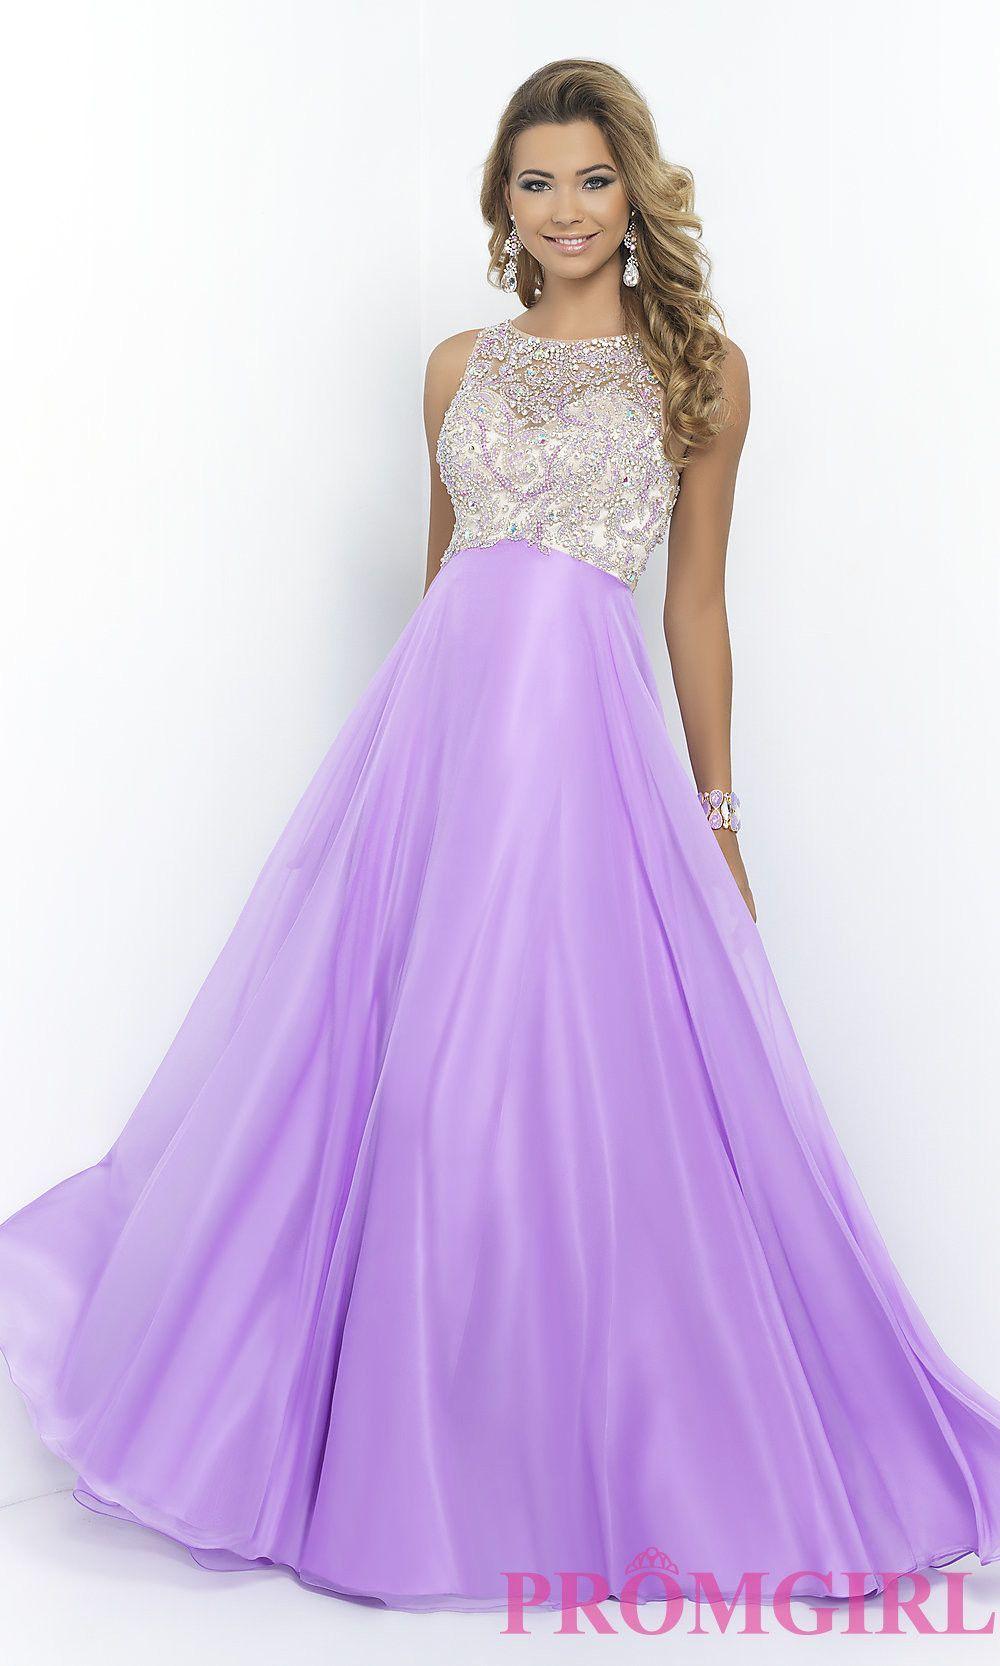 Blush Prom 9917 | Products | Pinterest | Graduación, Baile de ...